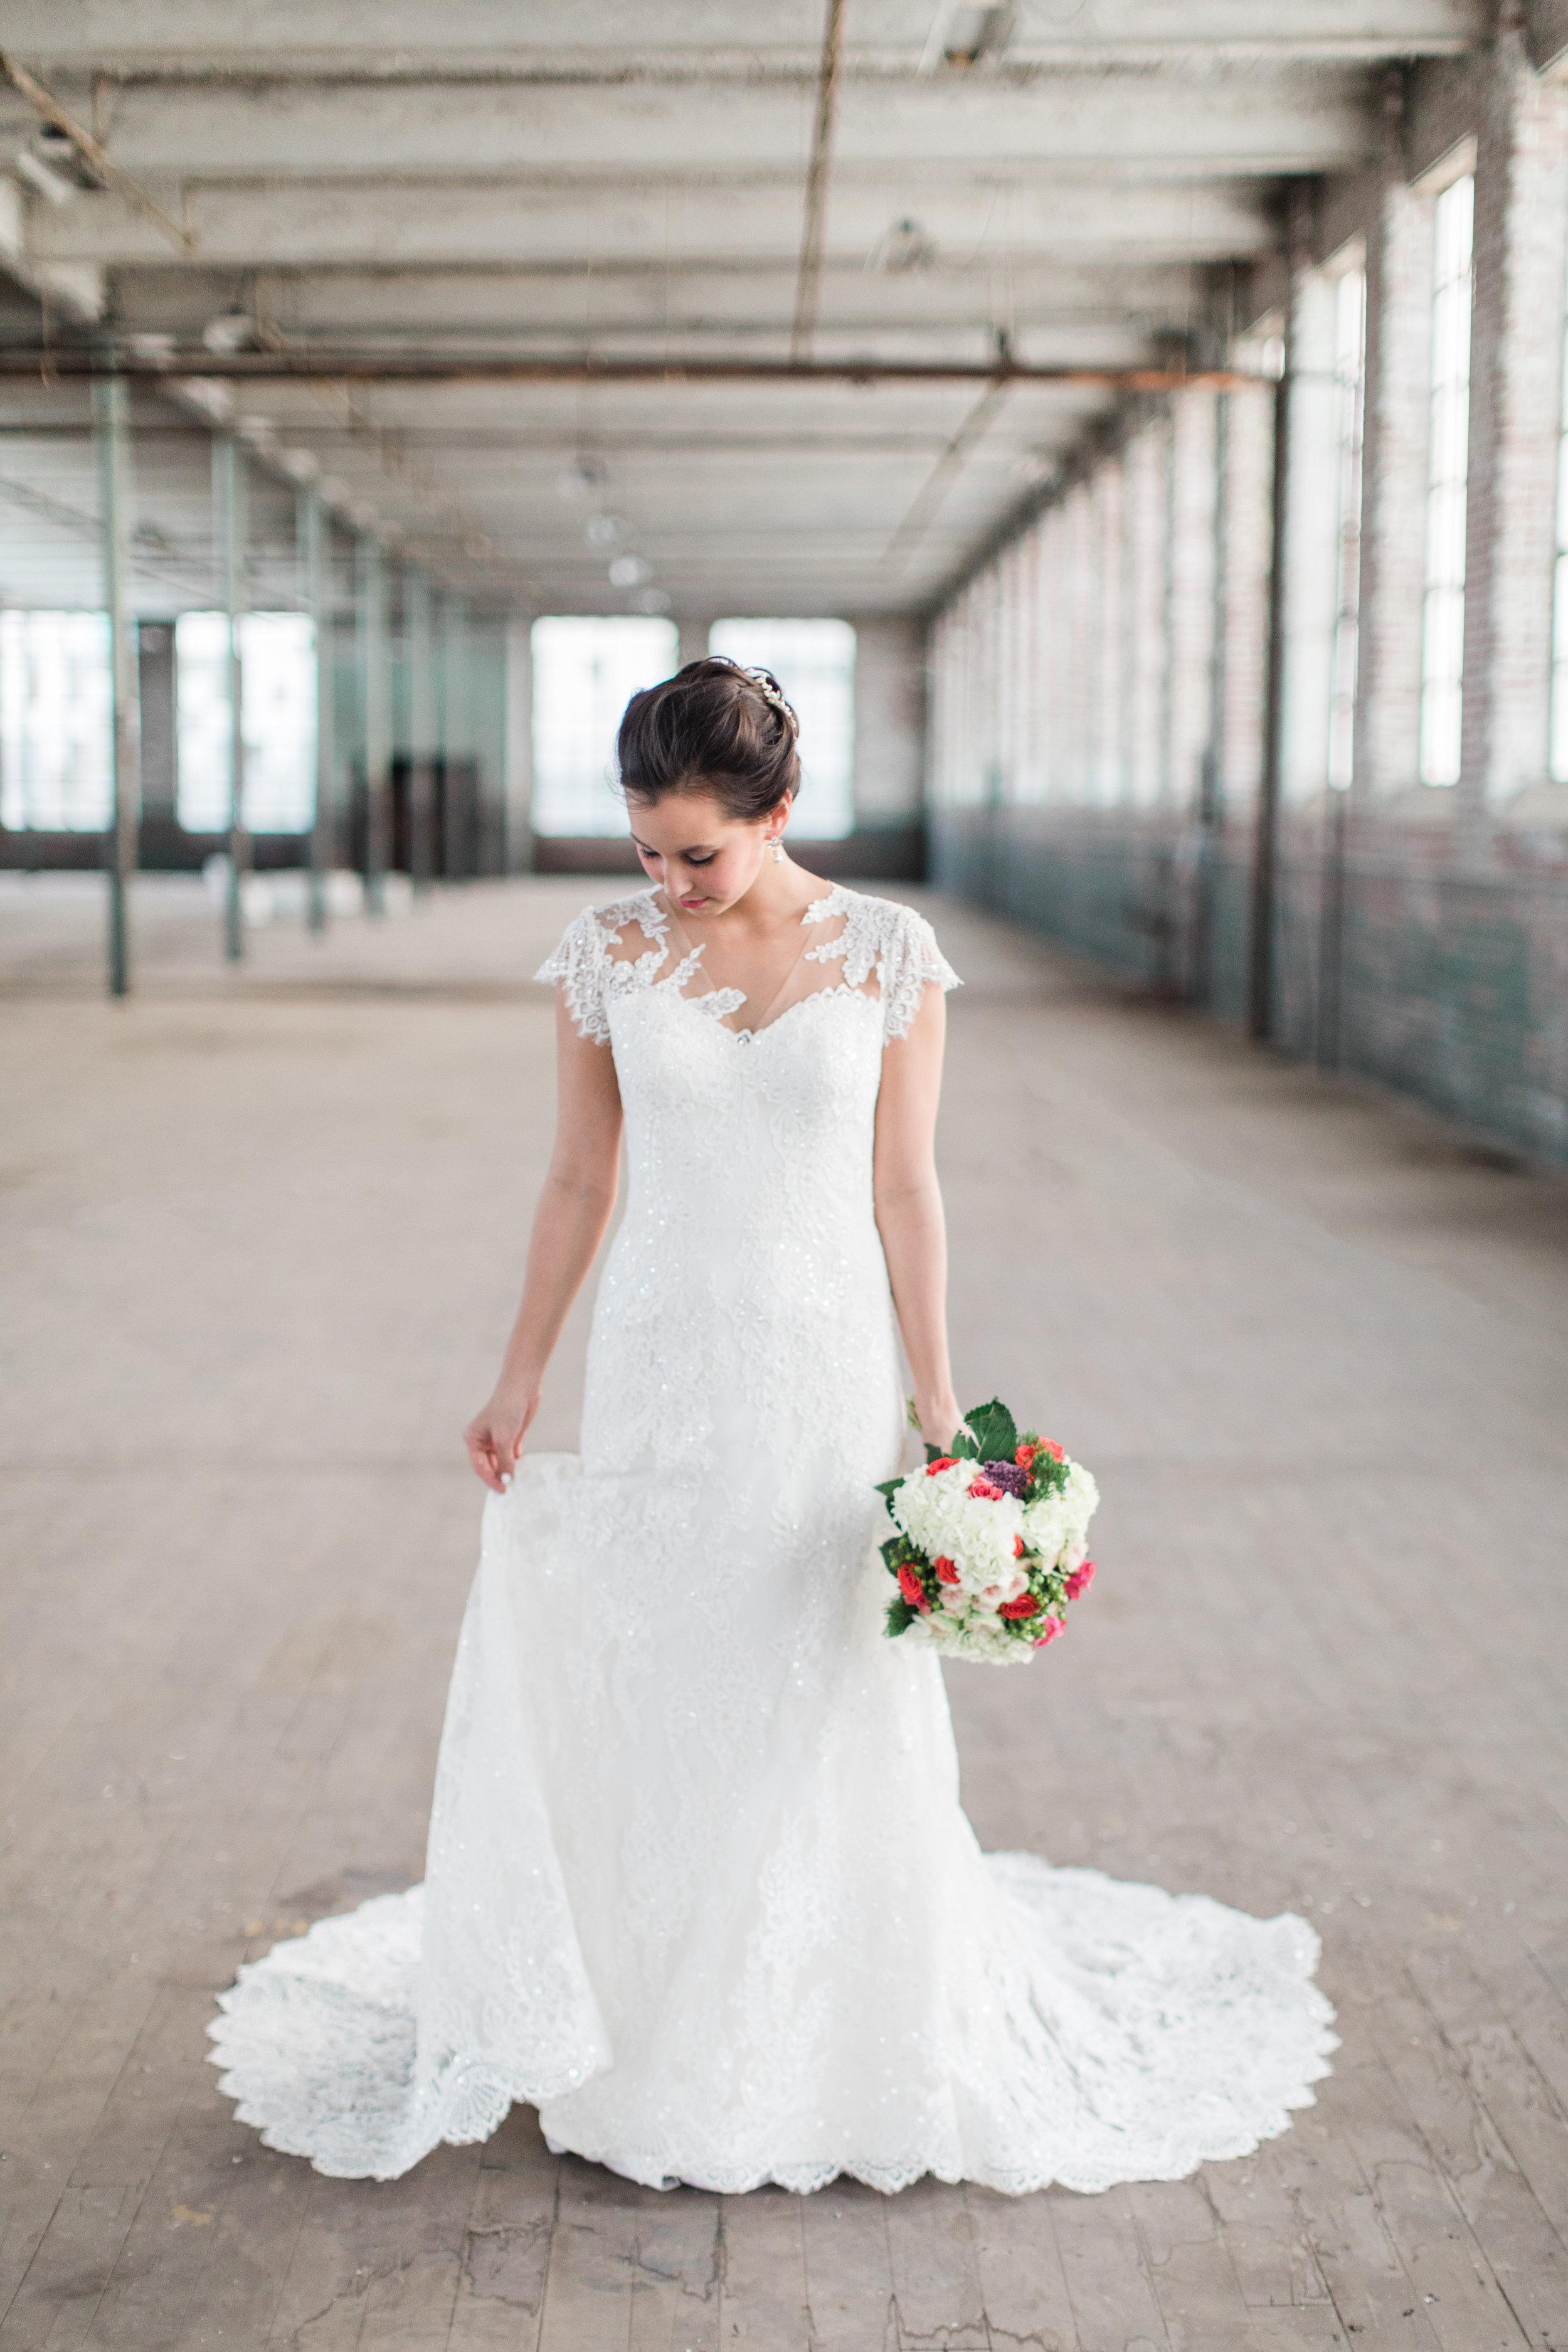 Megan-bridal-012.JPG